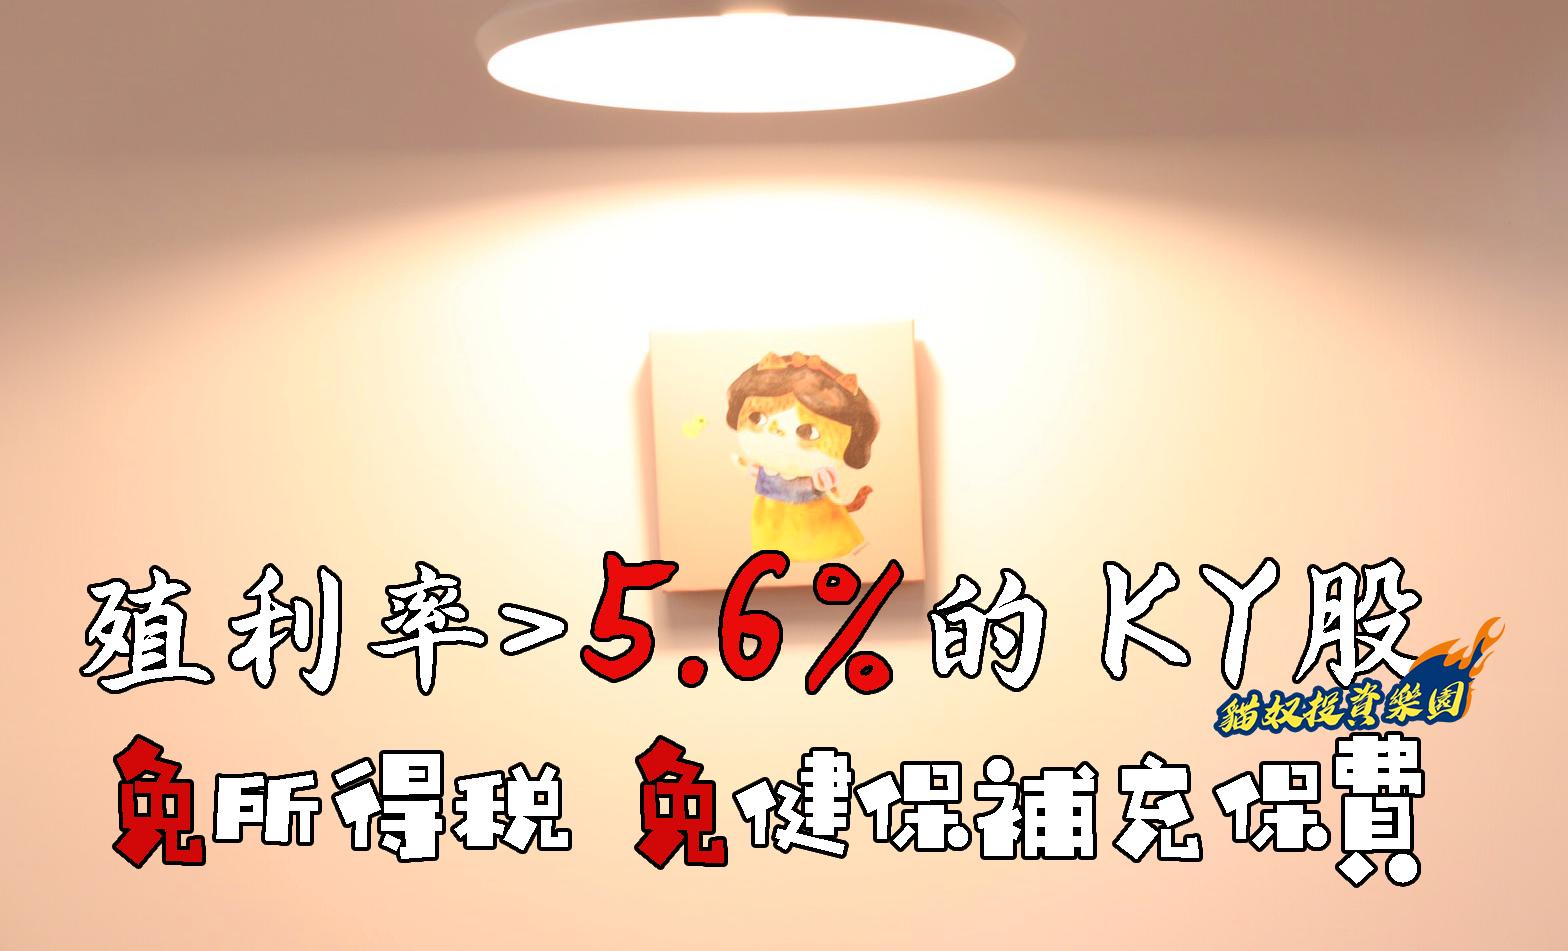 【KY 股篇】免所得稅、免 2 代健保!精選 1 檔 KY 股殖利率高達 5.6%,Q3 將迎旺季!